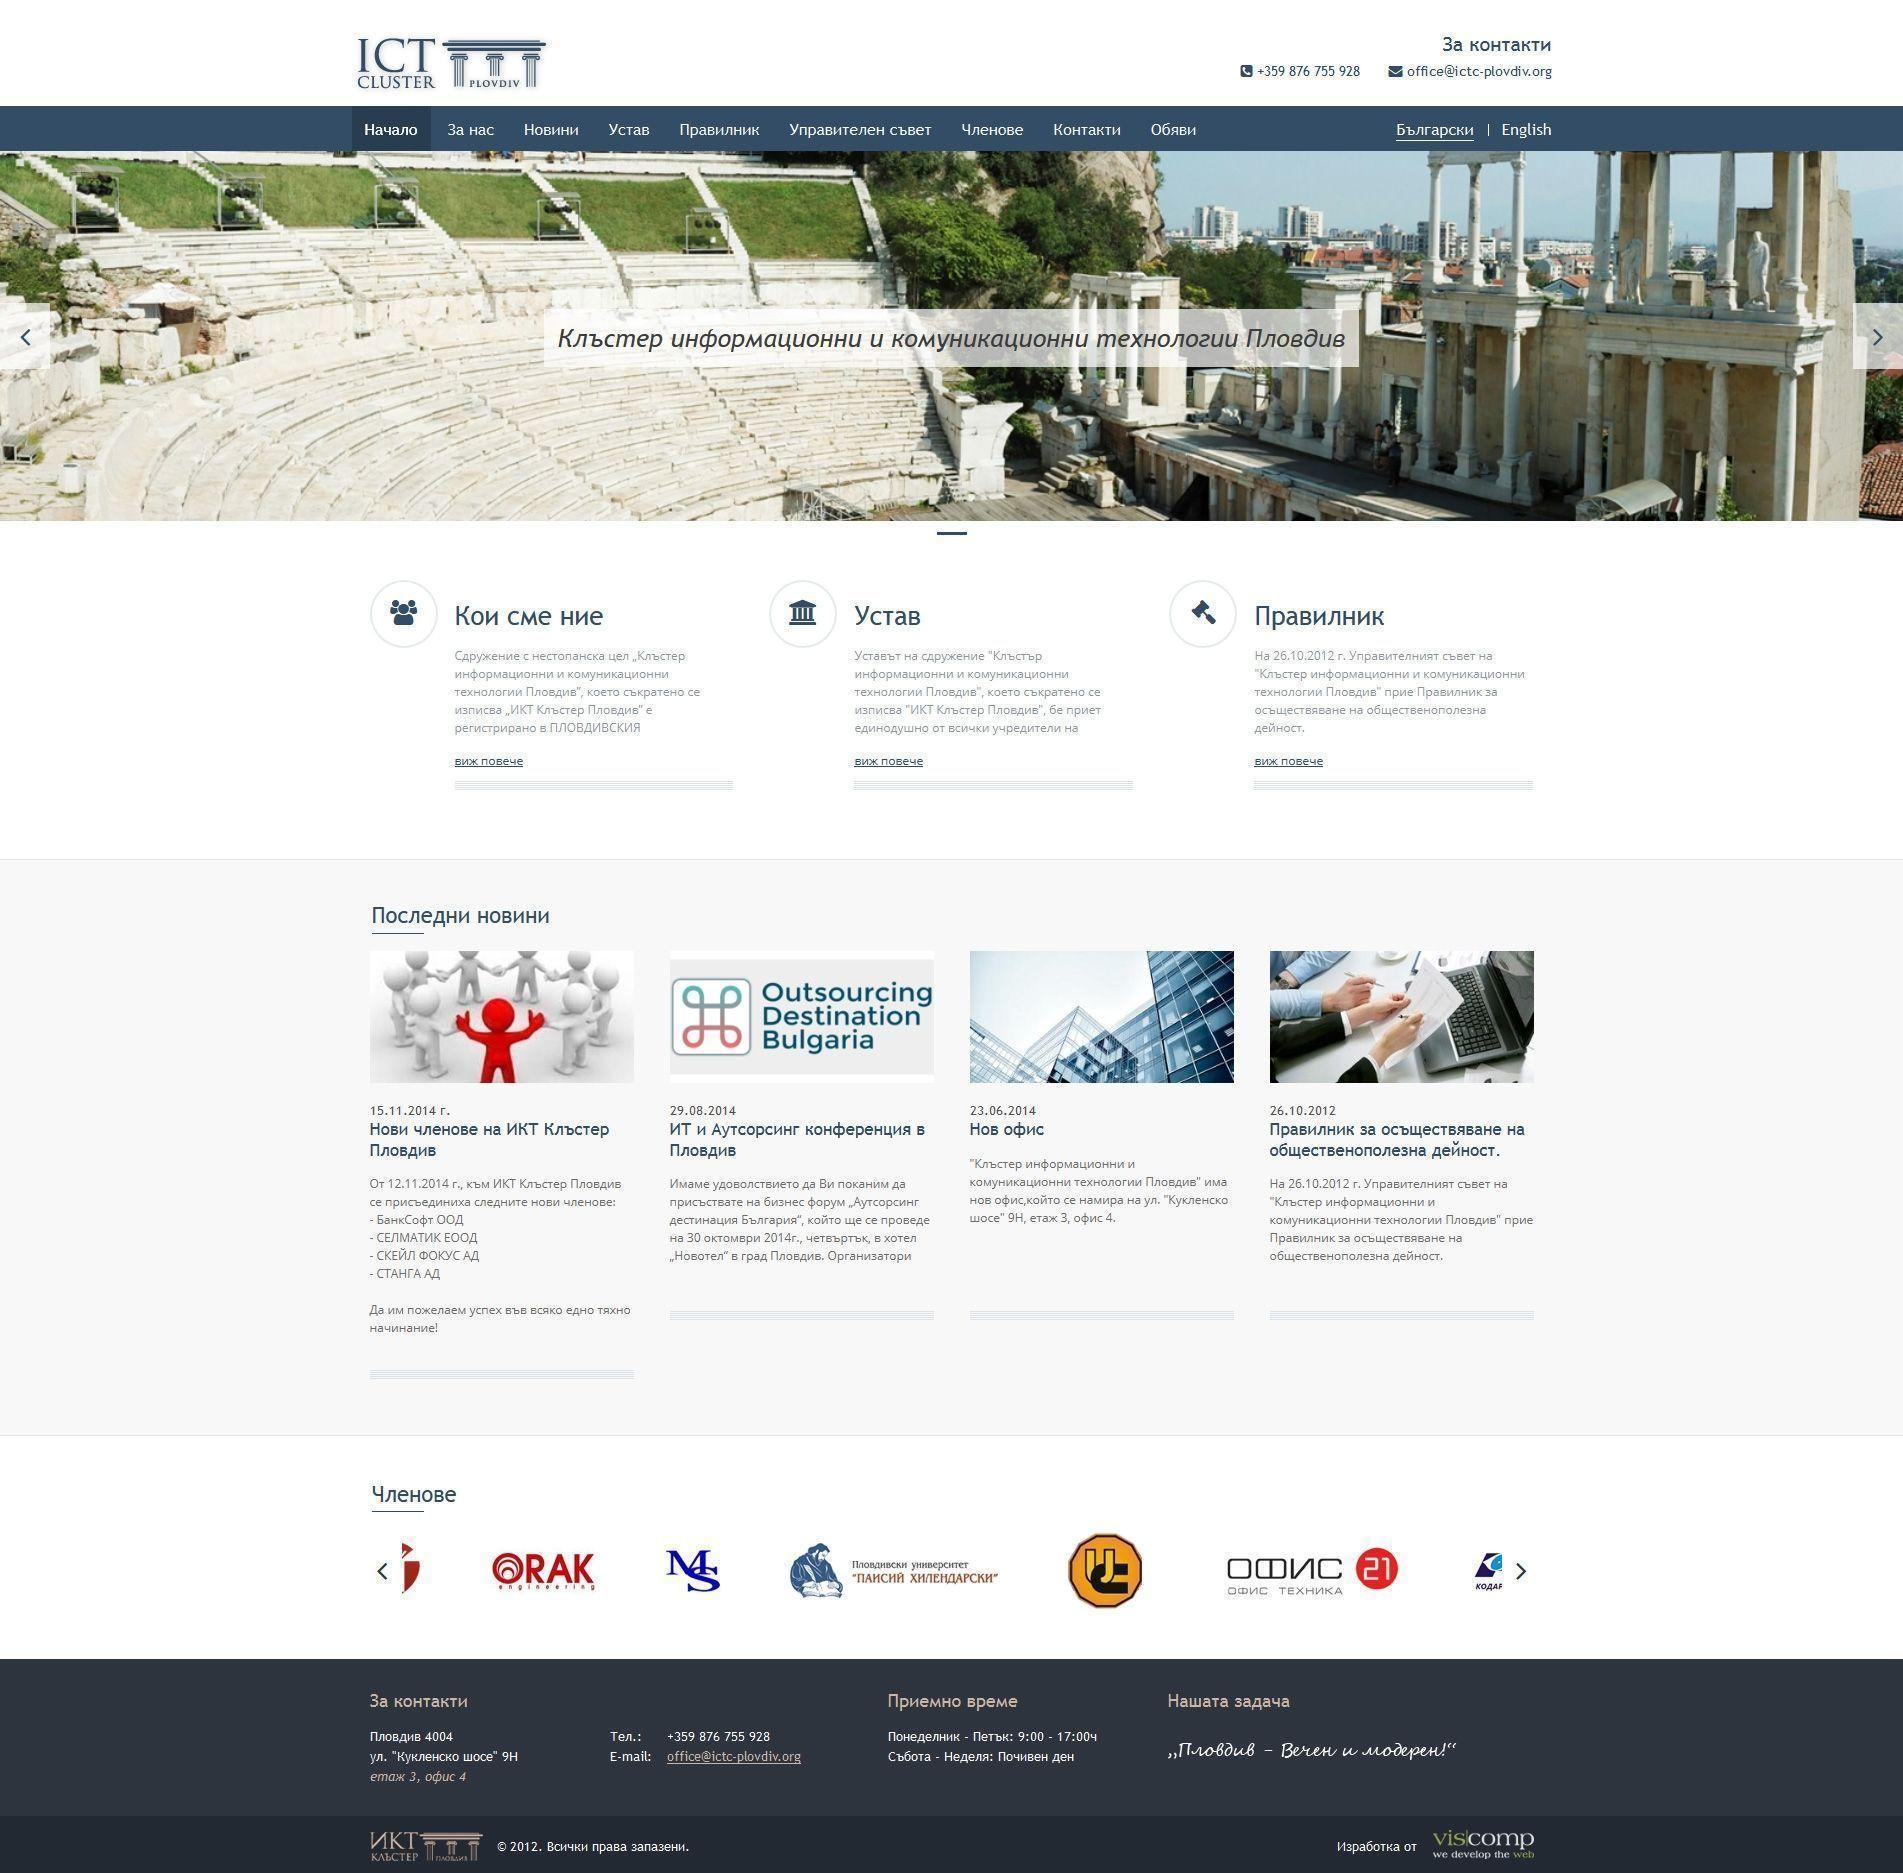 8271262-ictc-plovdiv.org